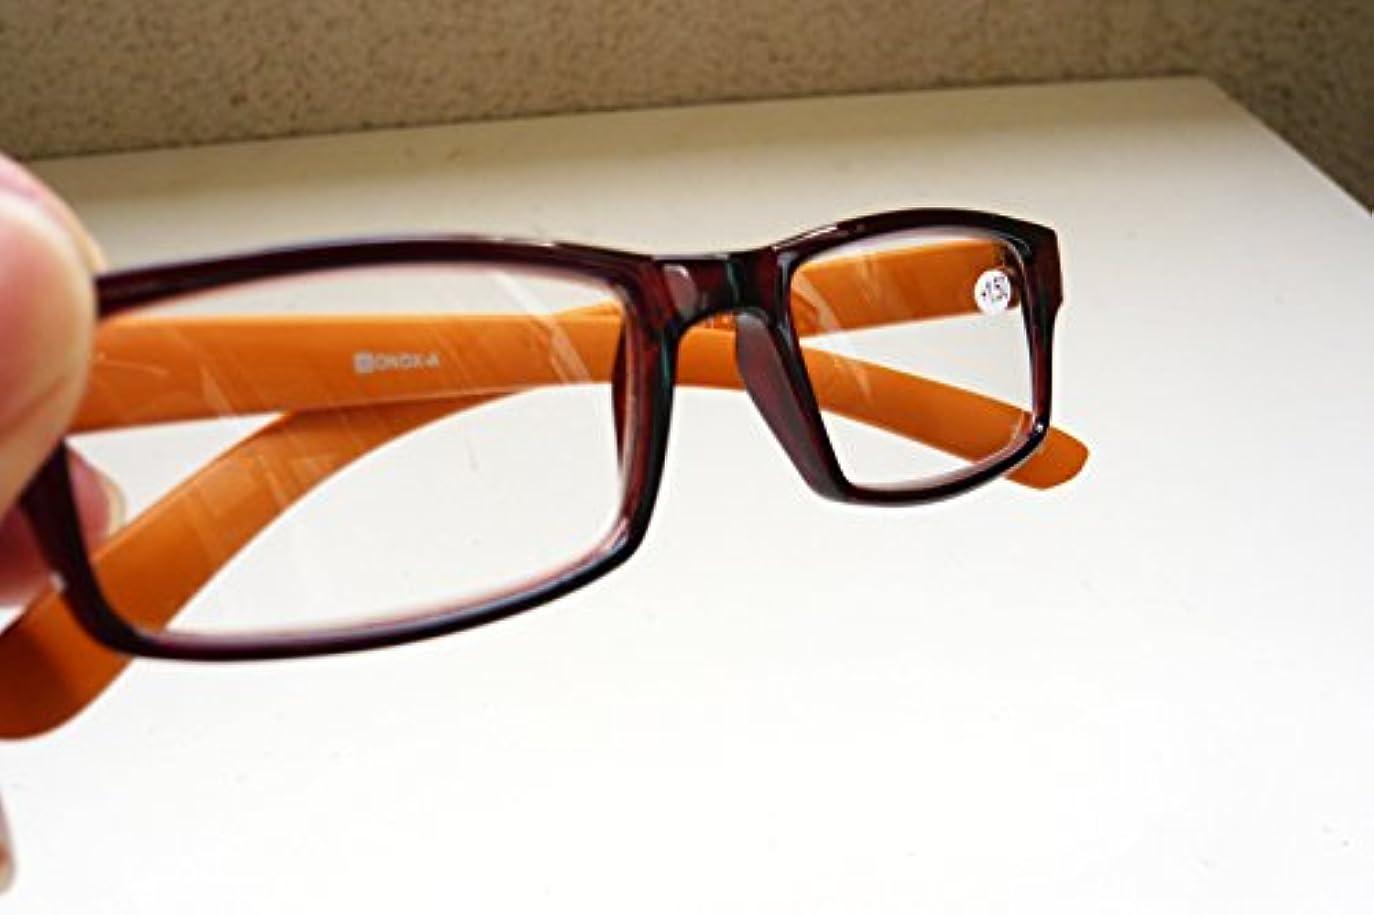 [DULTON BONOX]ダルトン Reading glasses  老眼鏡 YGF71BOR +2.5